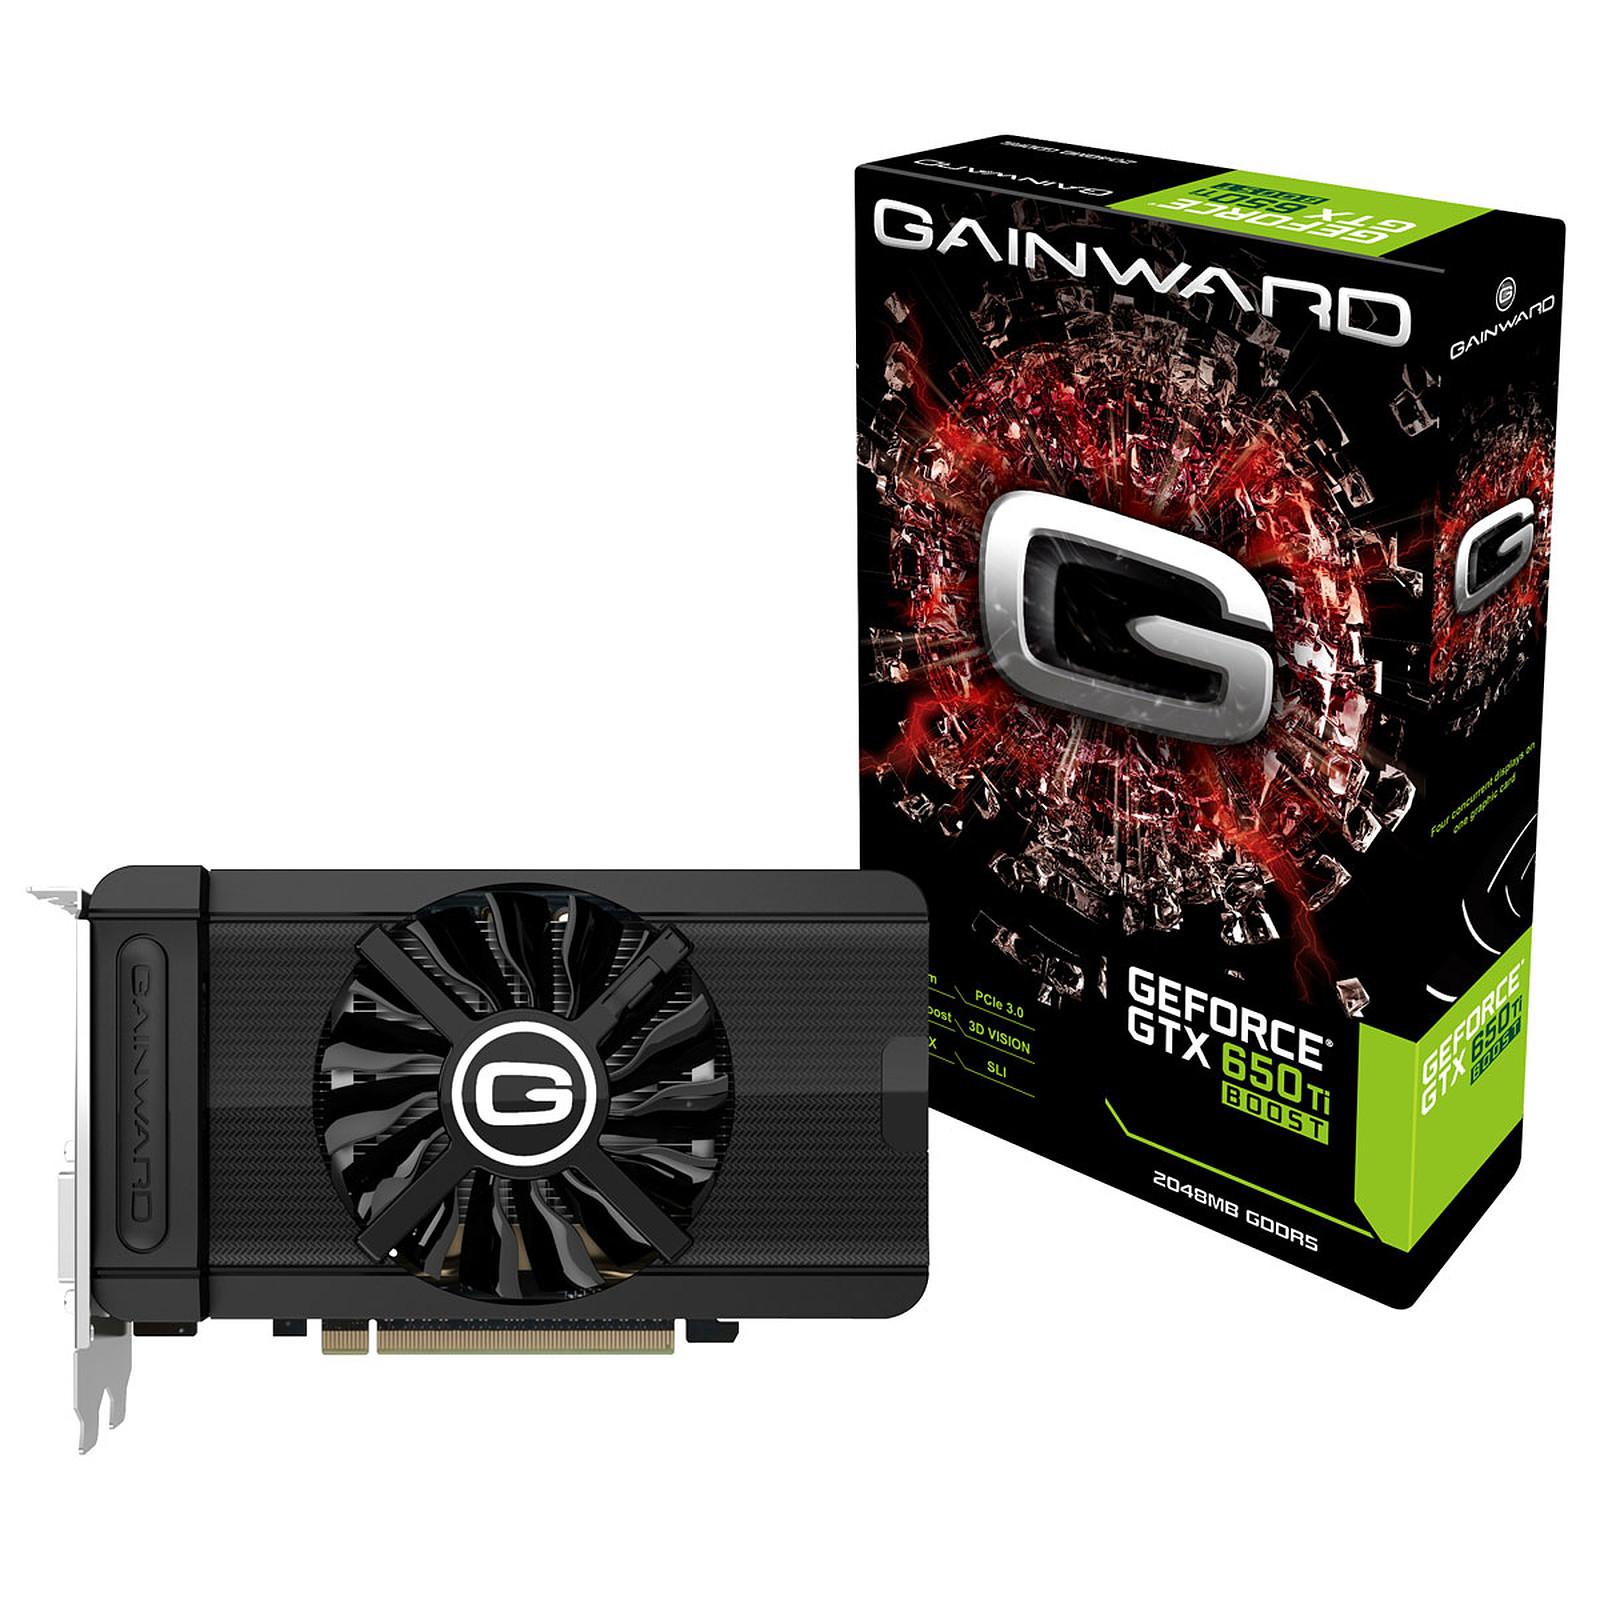 Gainward GeForce GTX 650 Ti BOOST 2 Go